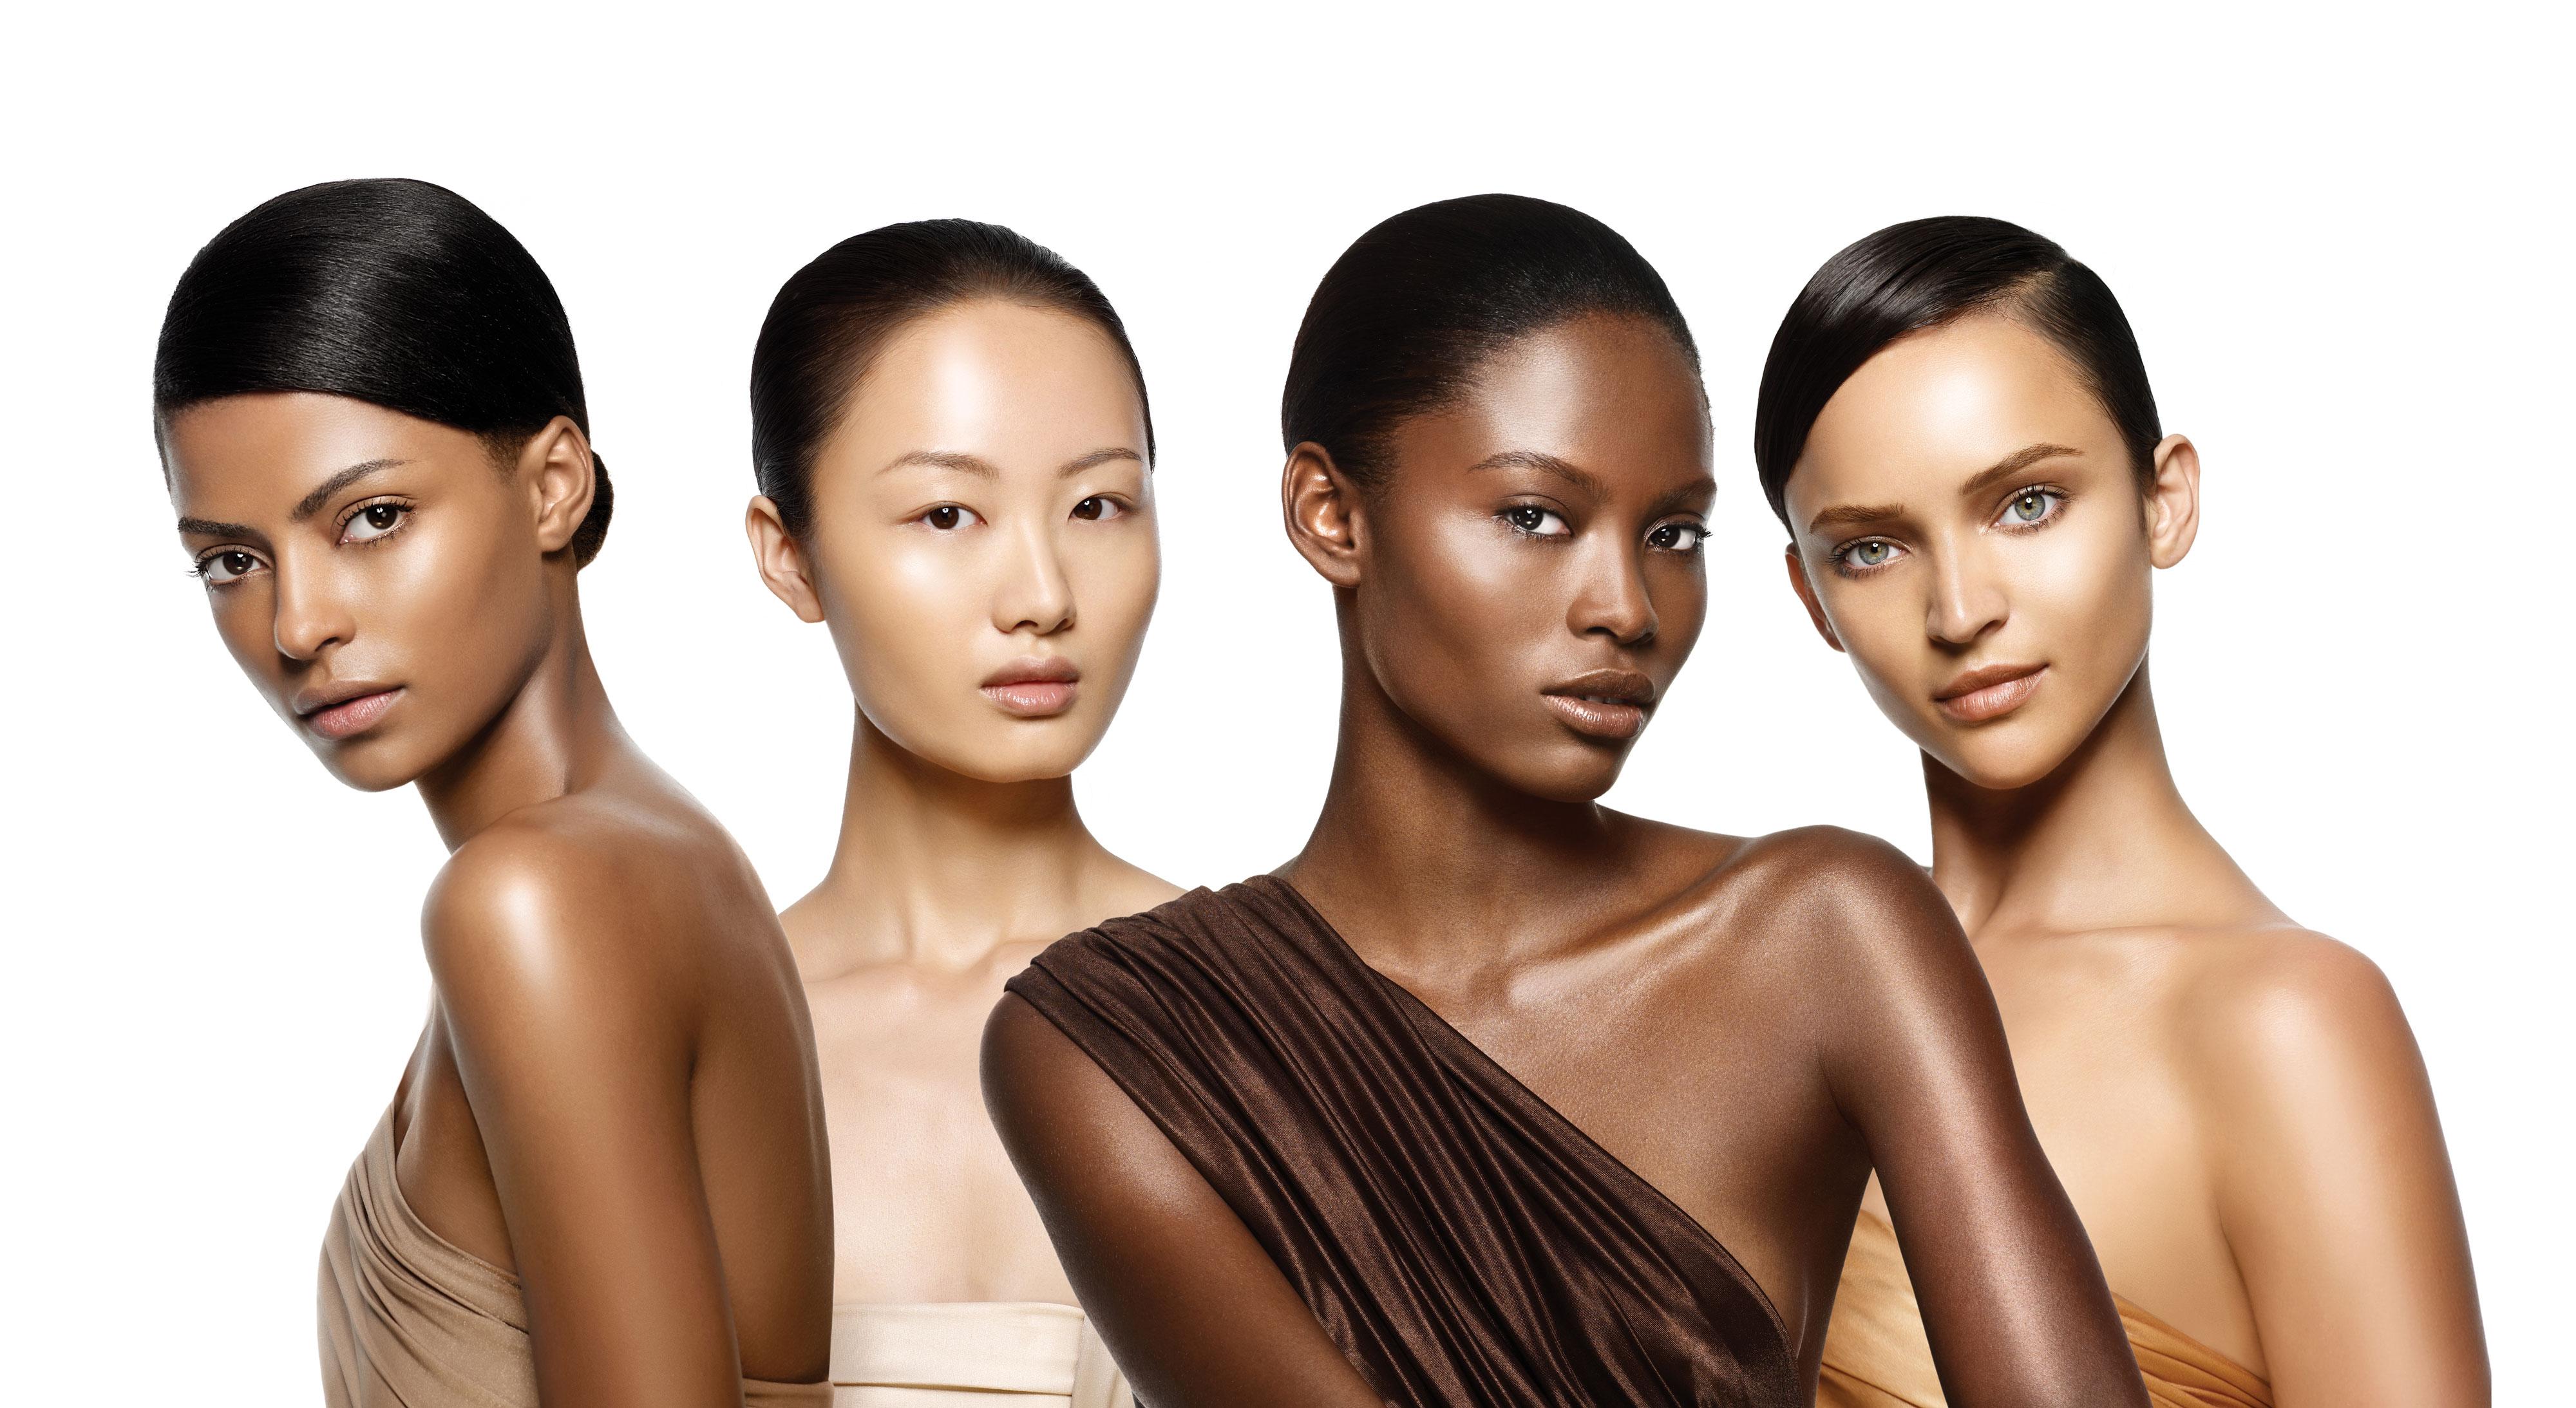 Photo: Iman Cosmetics